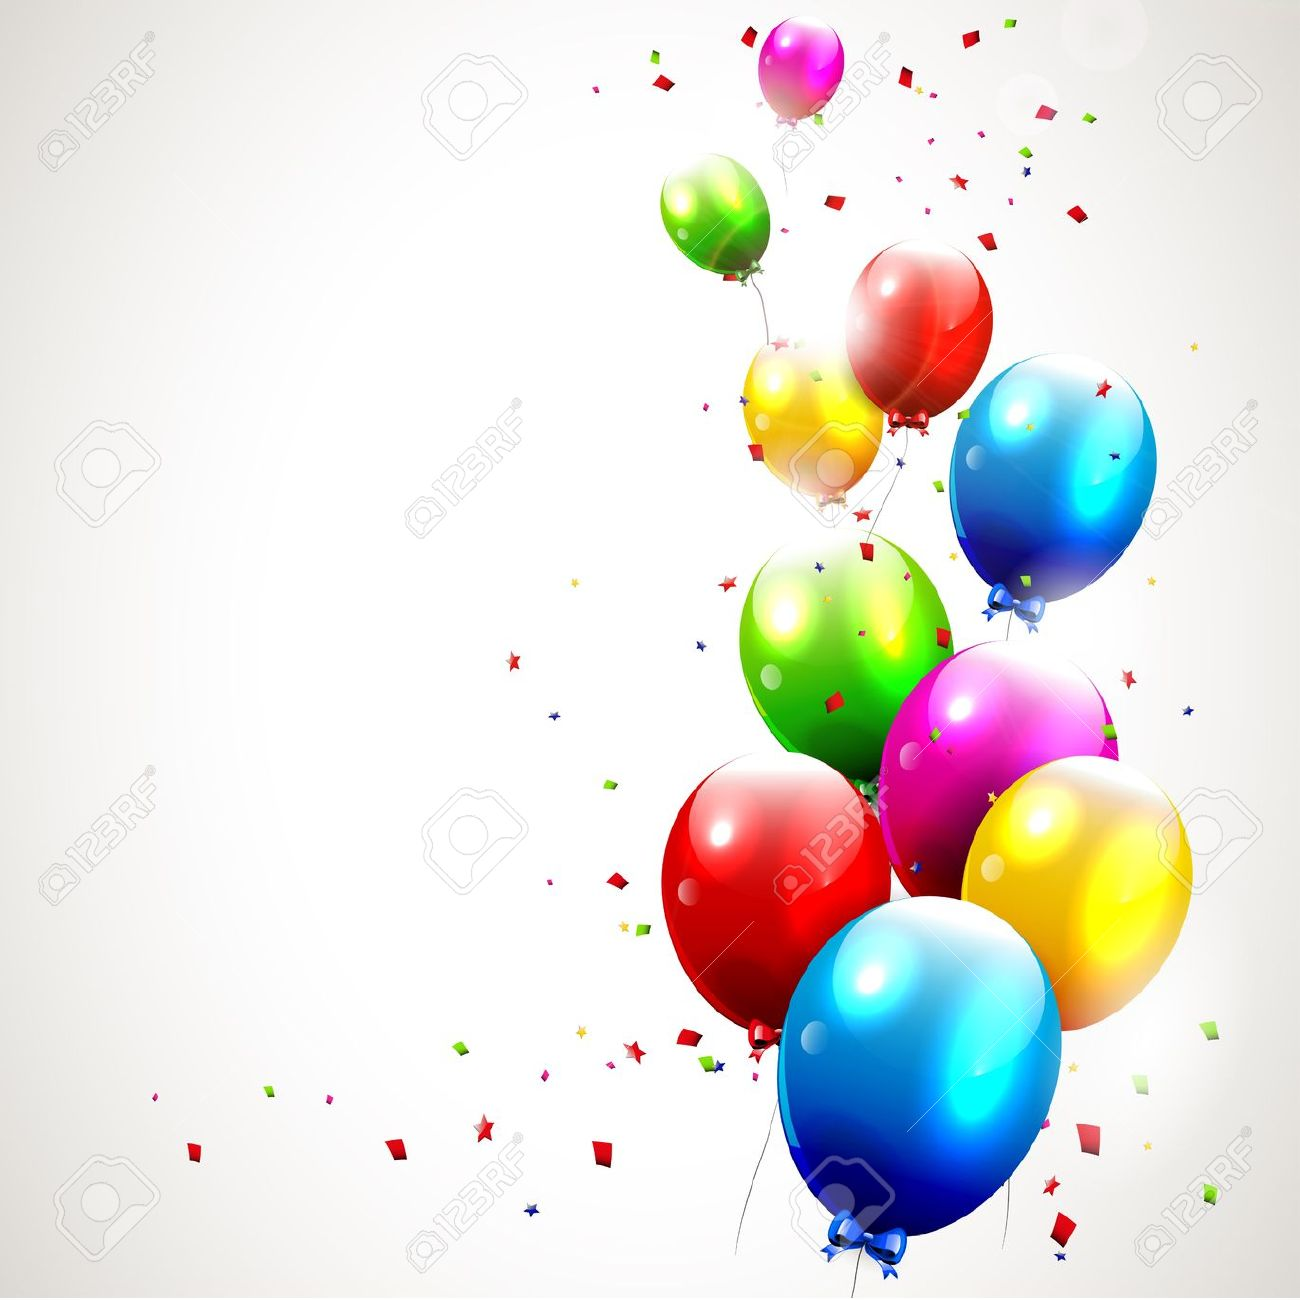 Clipart luftballon geburtstag clip free library Luftballons Blau Lizenzfreie Vektorgrafiken Kaufen: 123RF clip free library